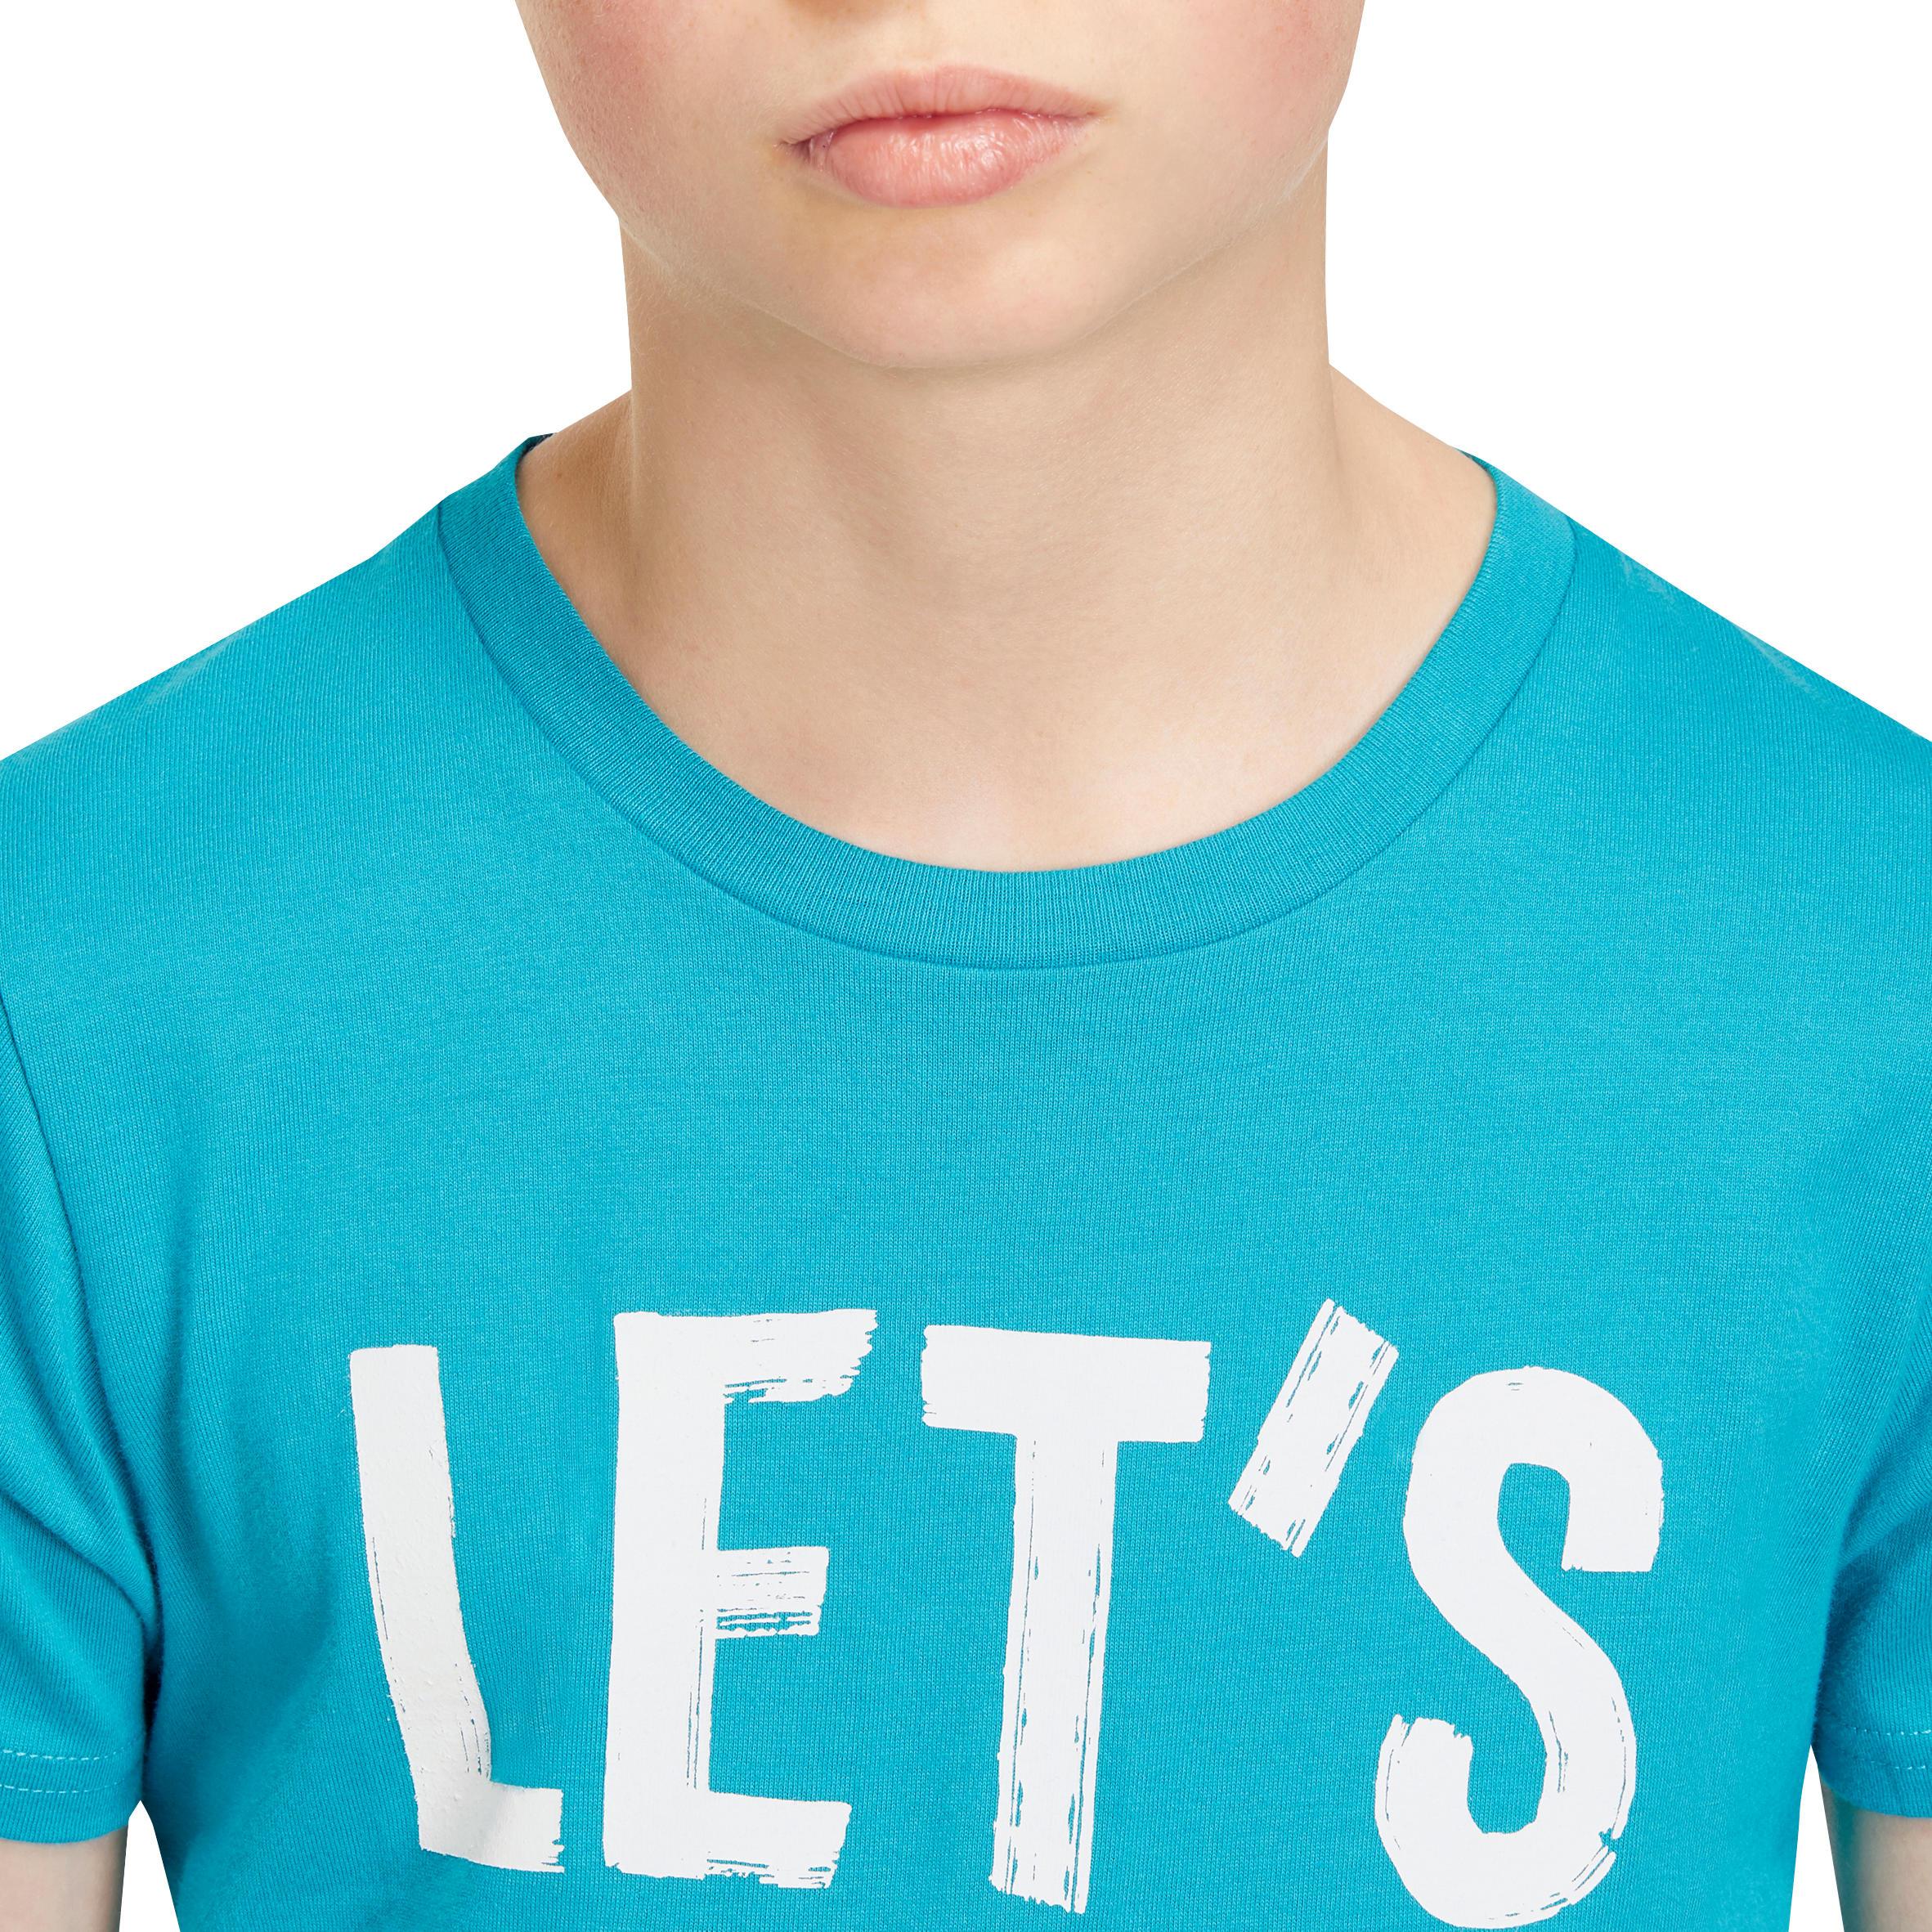 Boys' Short-Sleeved Gym T-Shirt - Petrol Blue Print